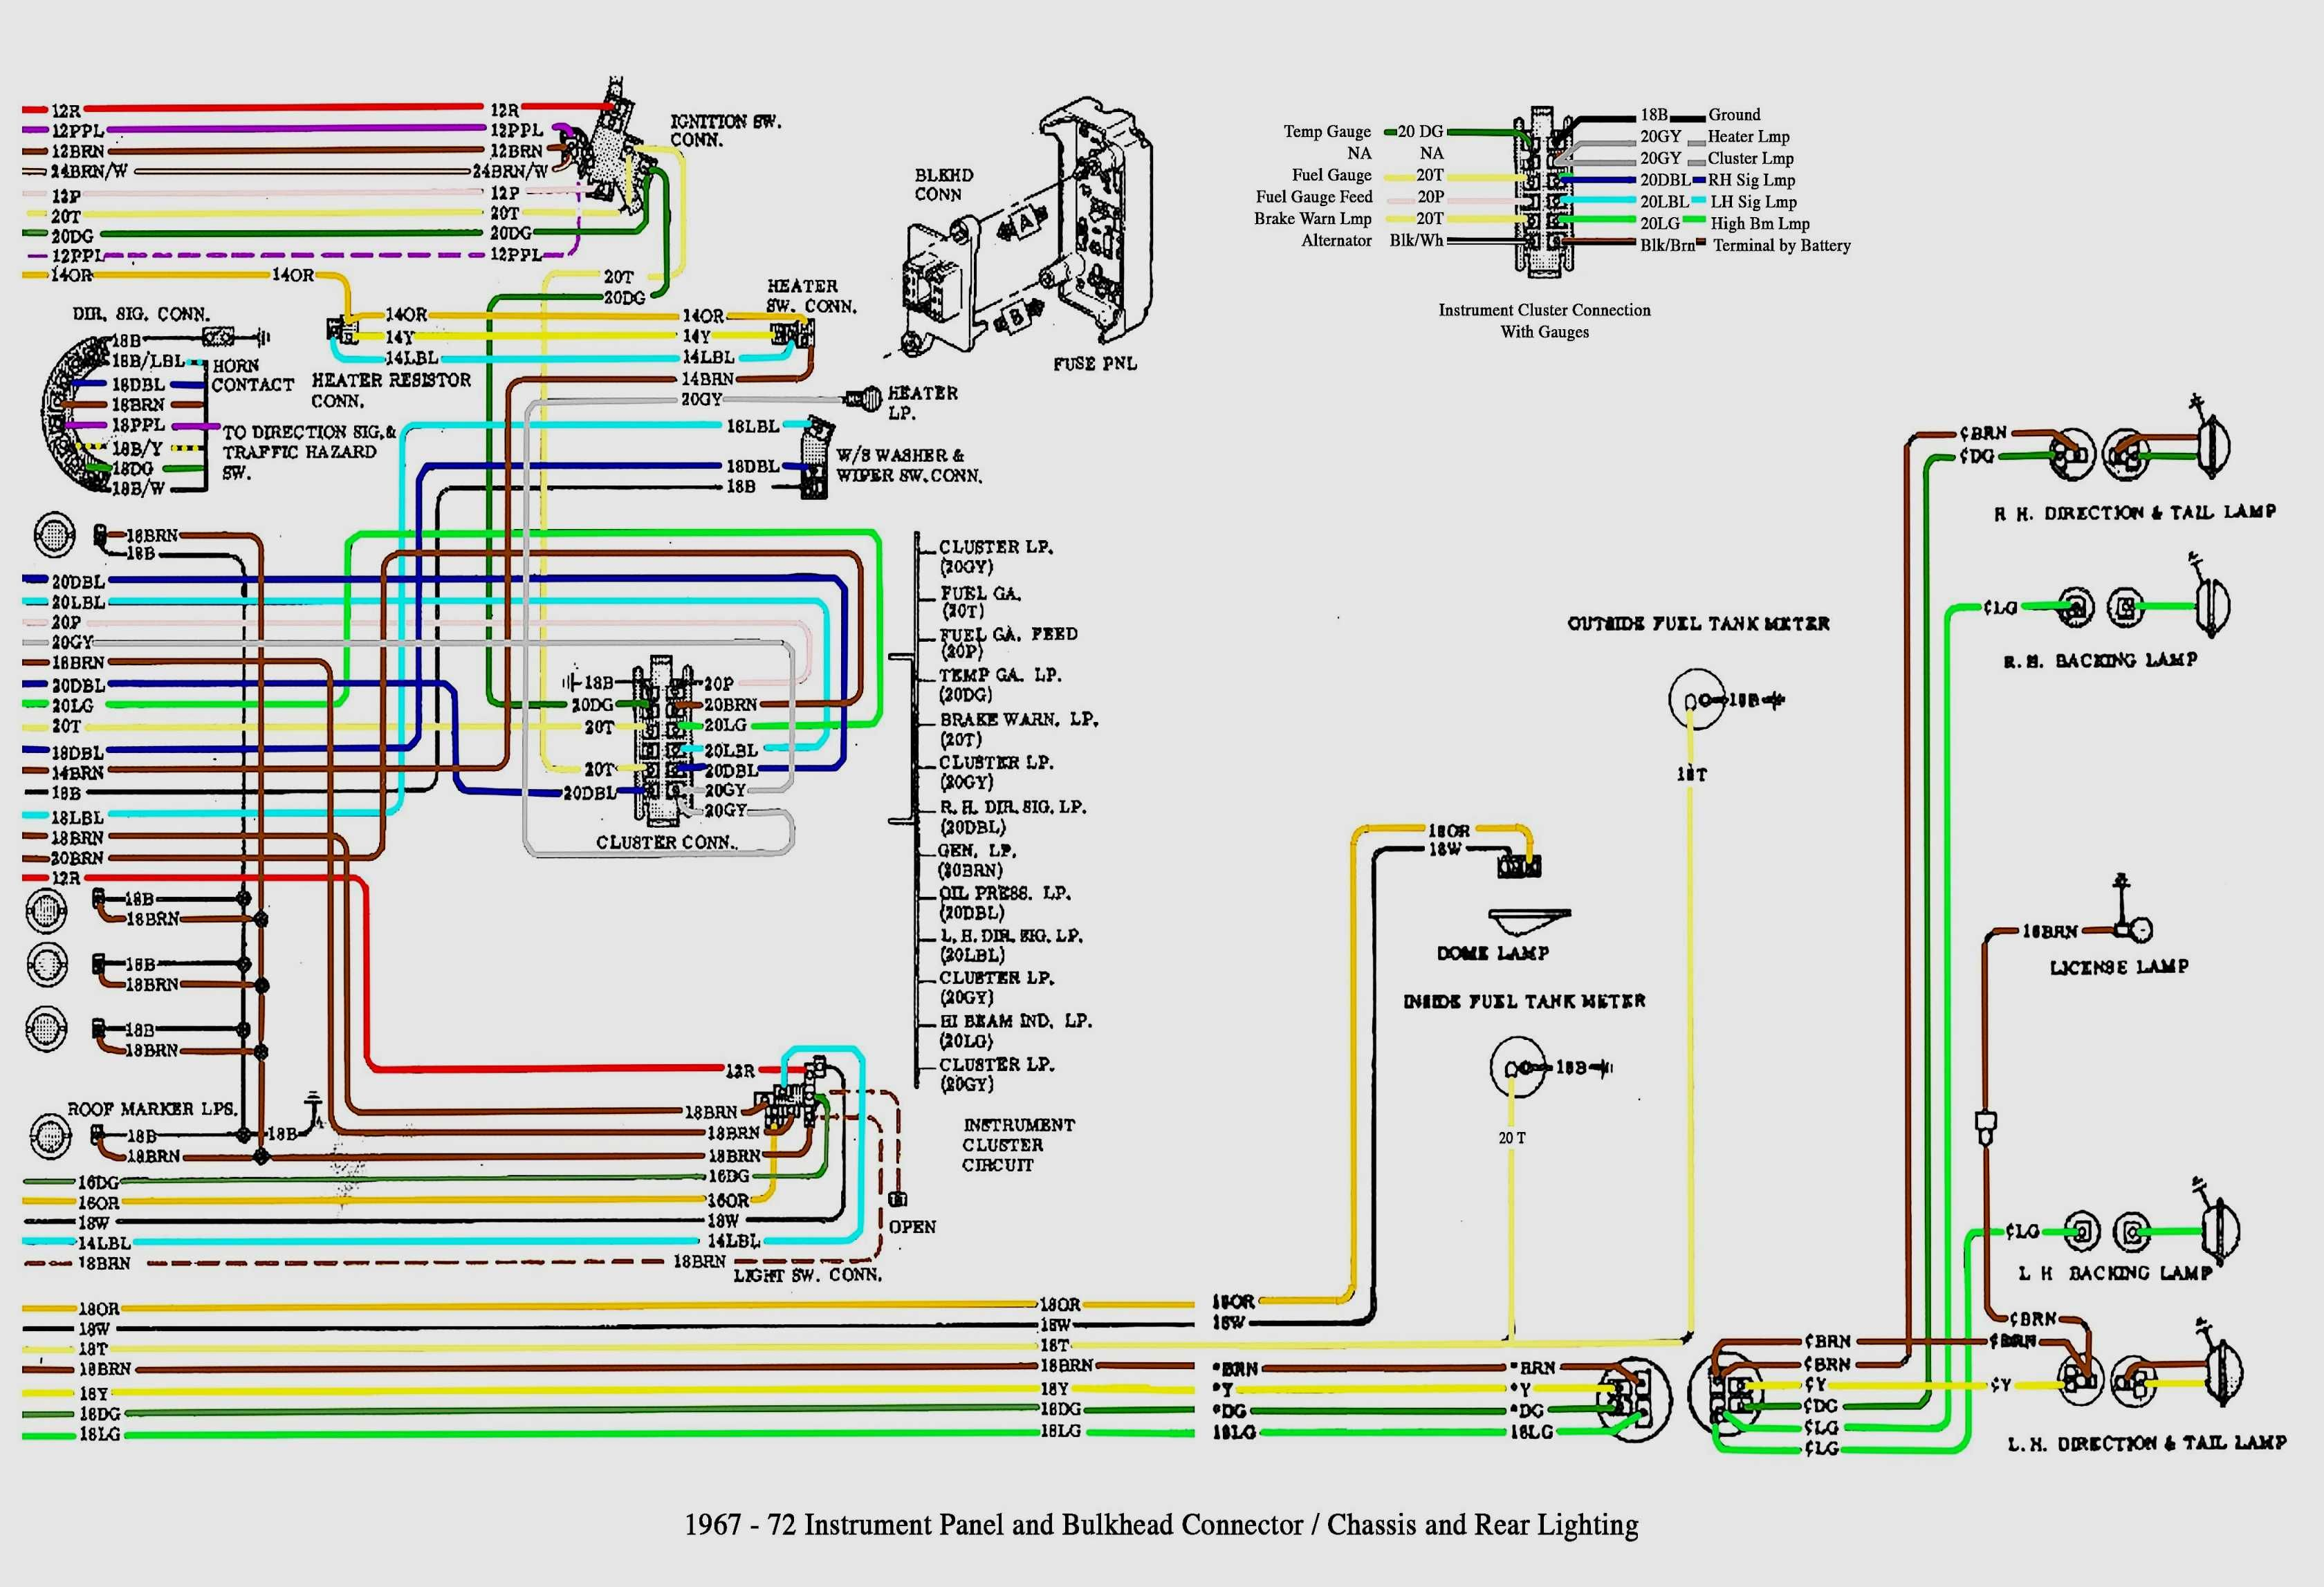 1980 Chevy El Camino Wiring Diagram - Wiring Schema